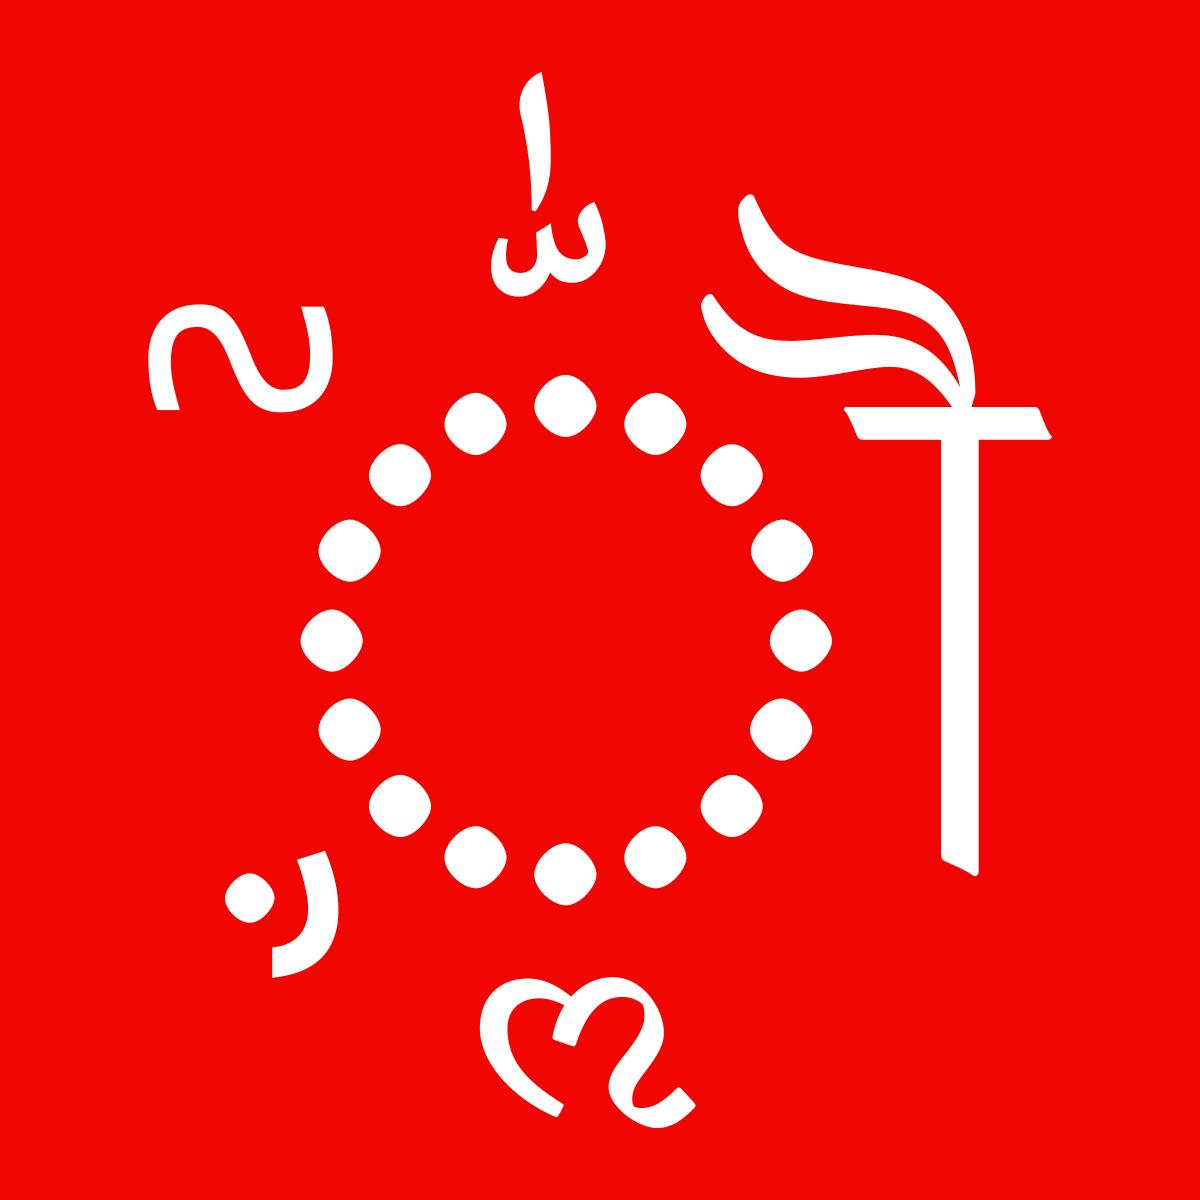 design by Liron Lavi Turkenich